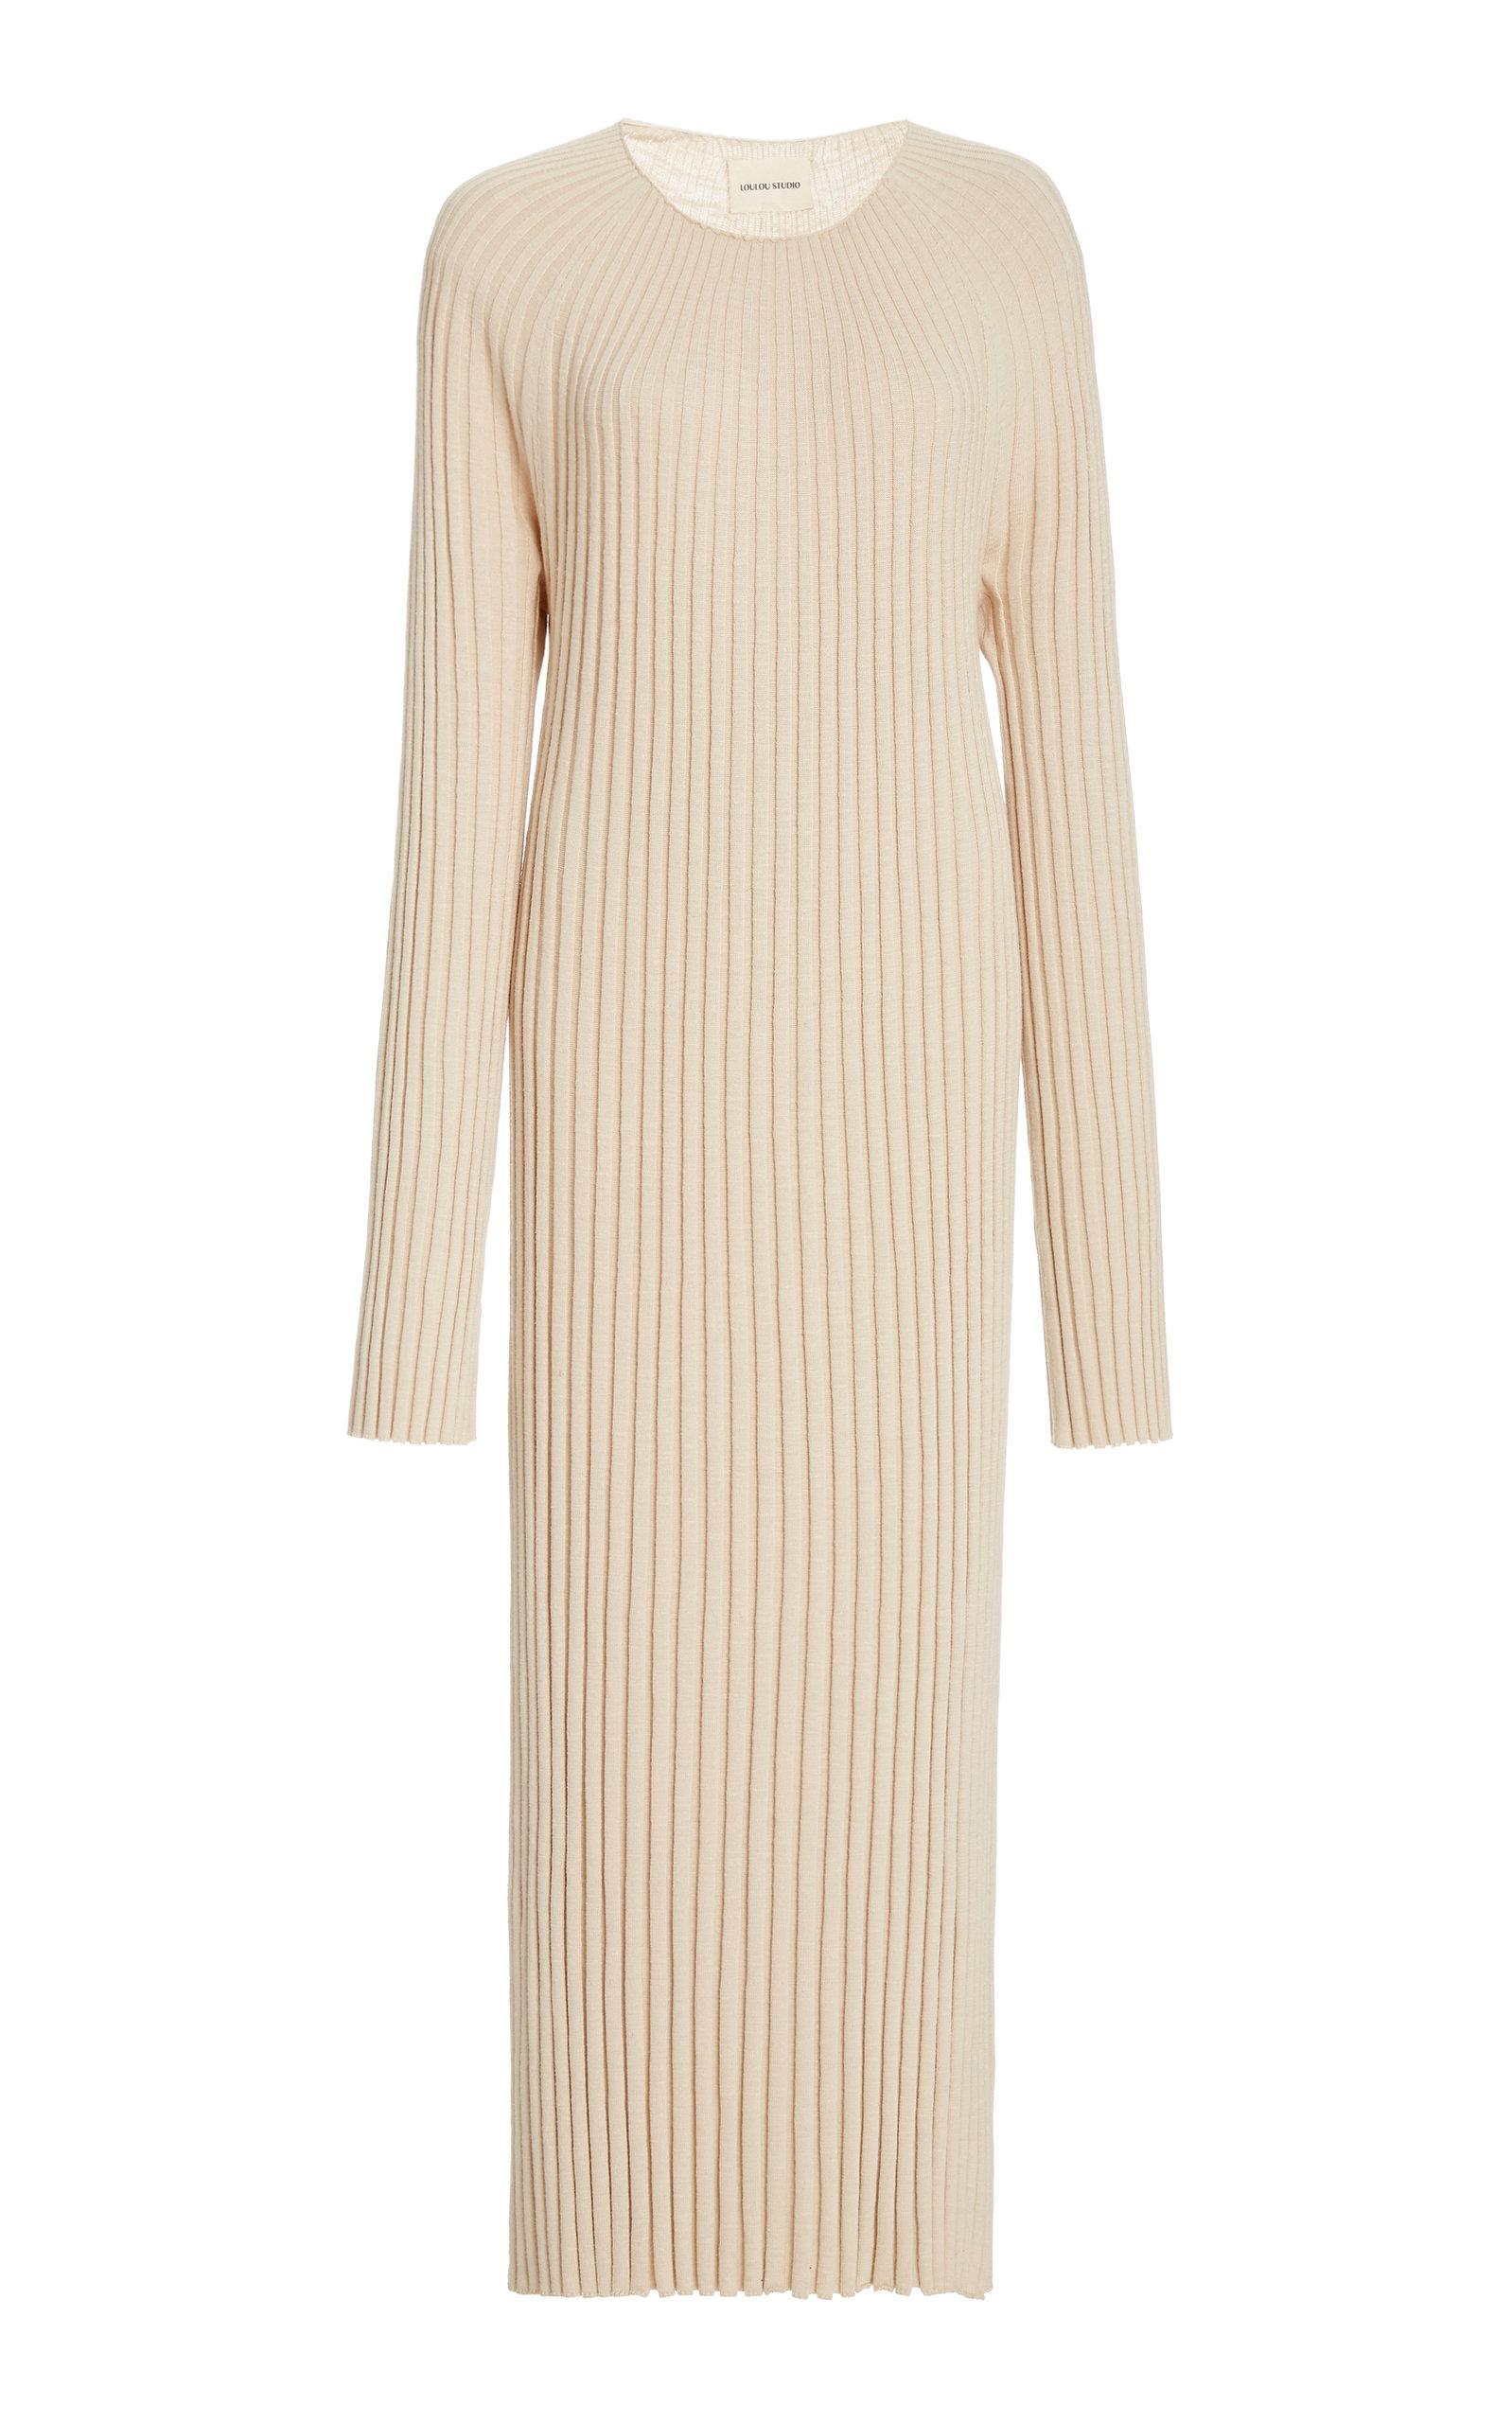 Buy Loulou Studio Uturoa Ribbed Silk-Blend Maxi Dress online, shop Loulou Studio at the best price